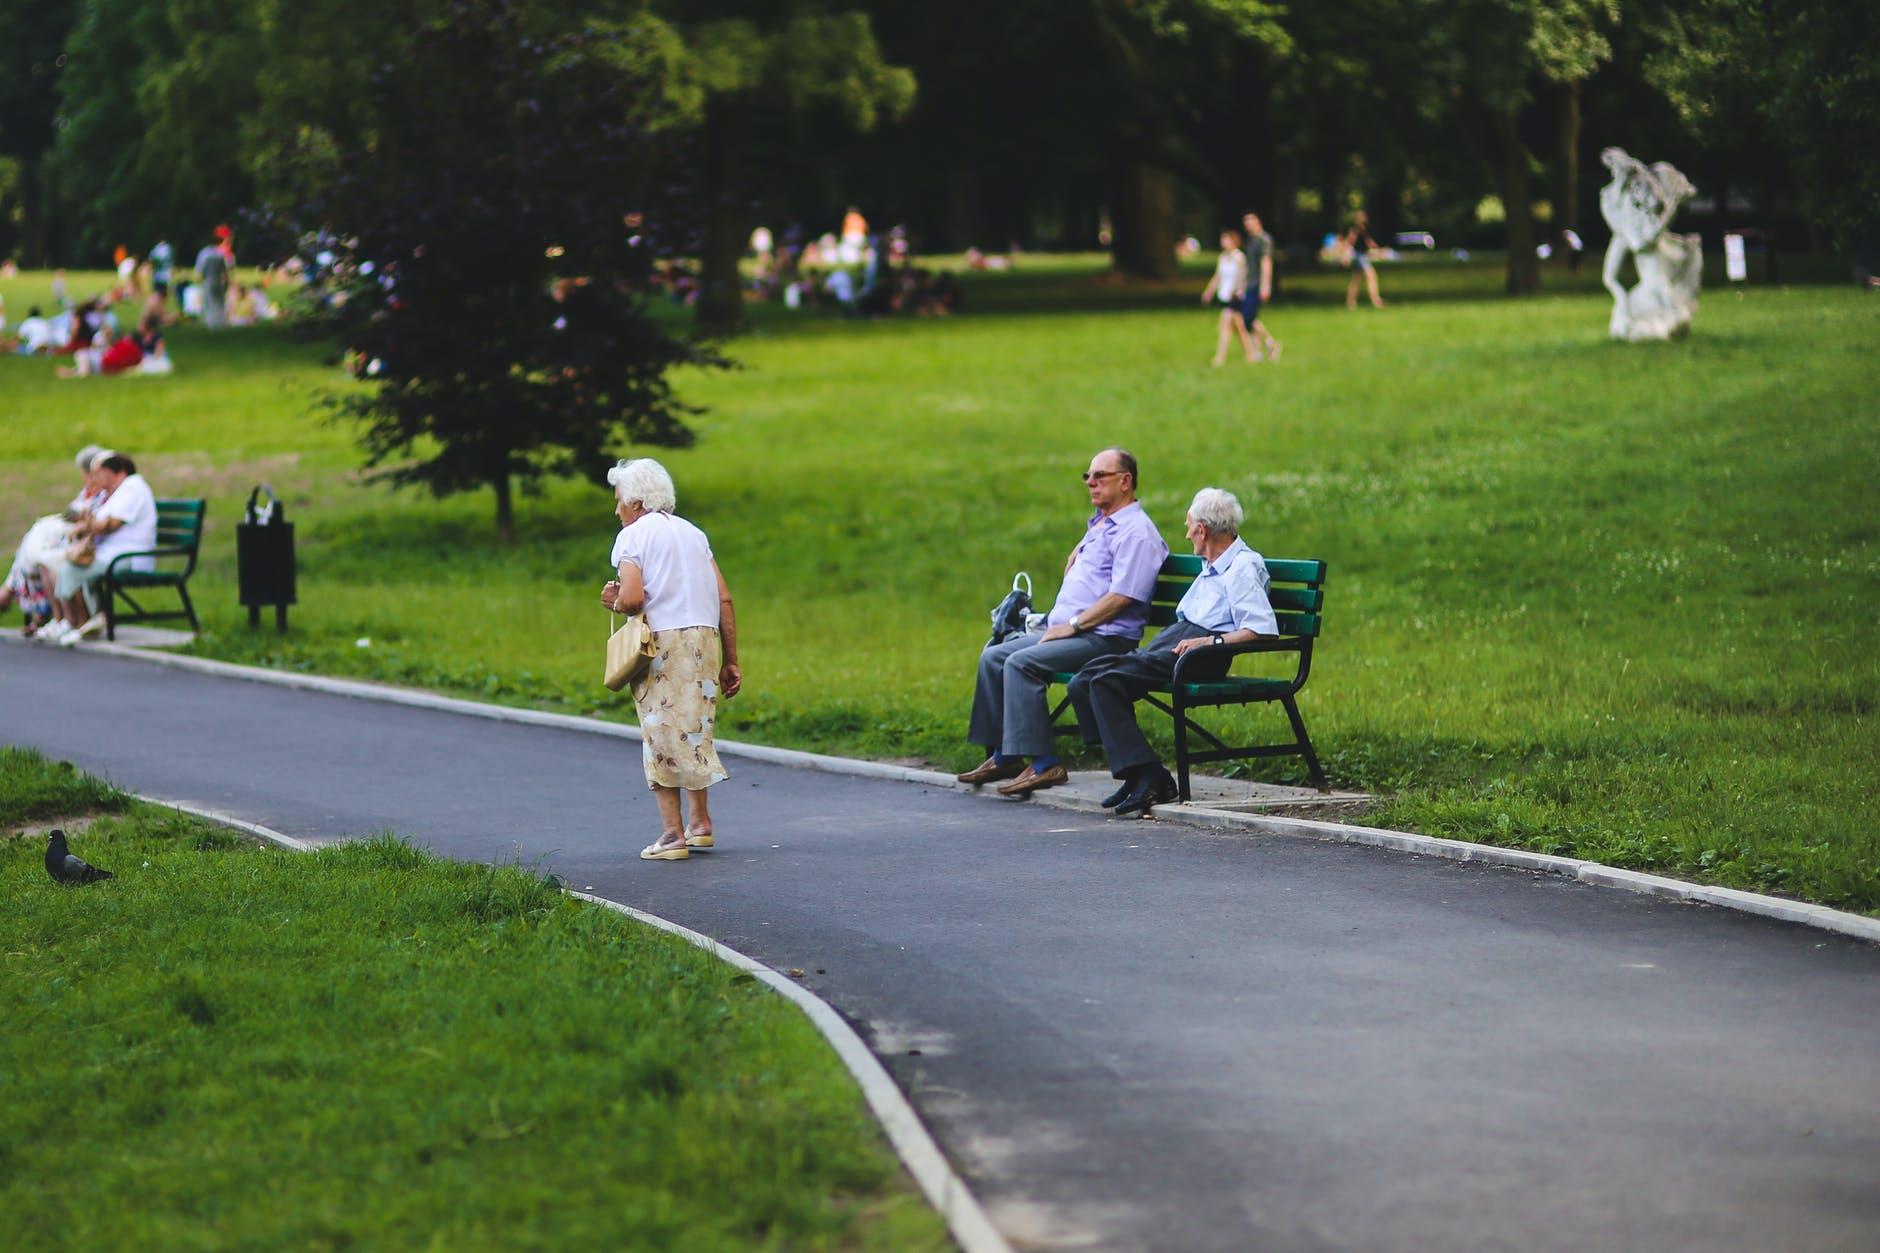 Finding the Right Senior Living Community